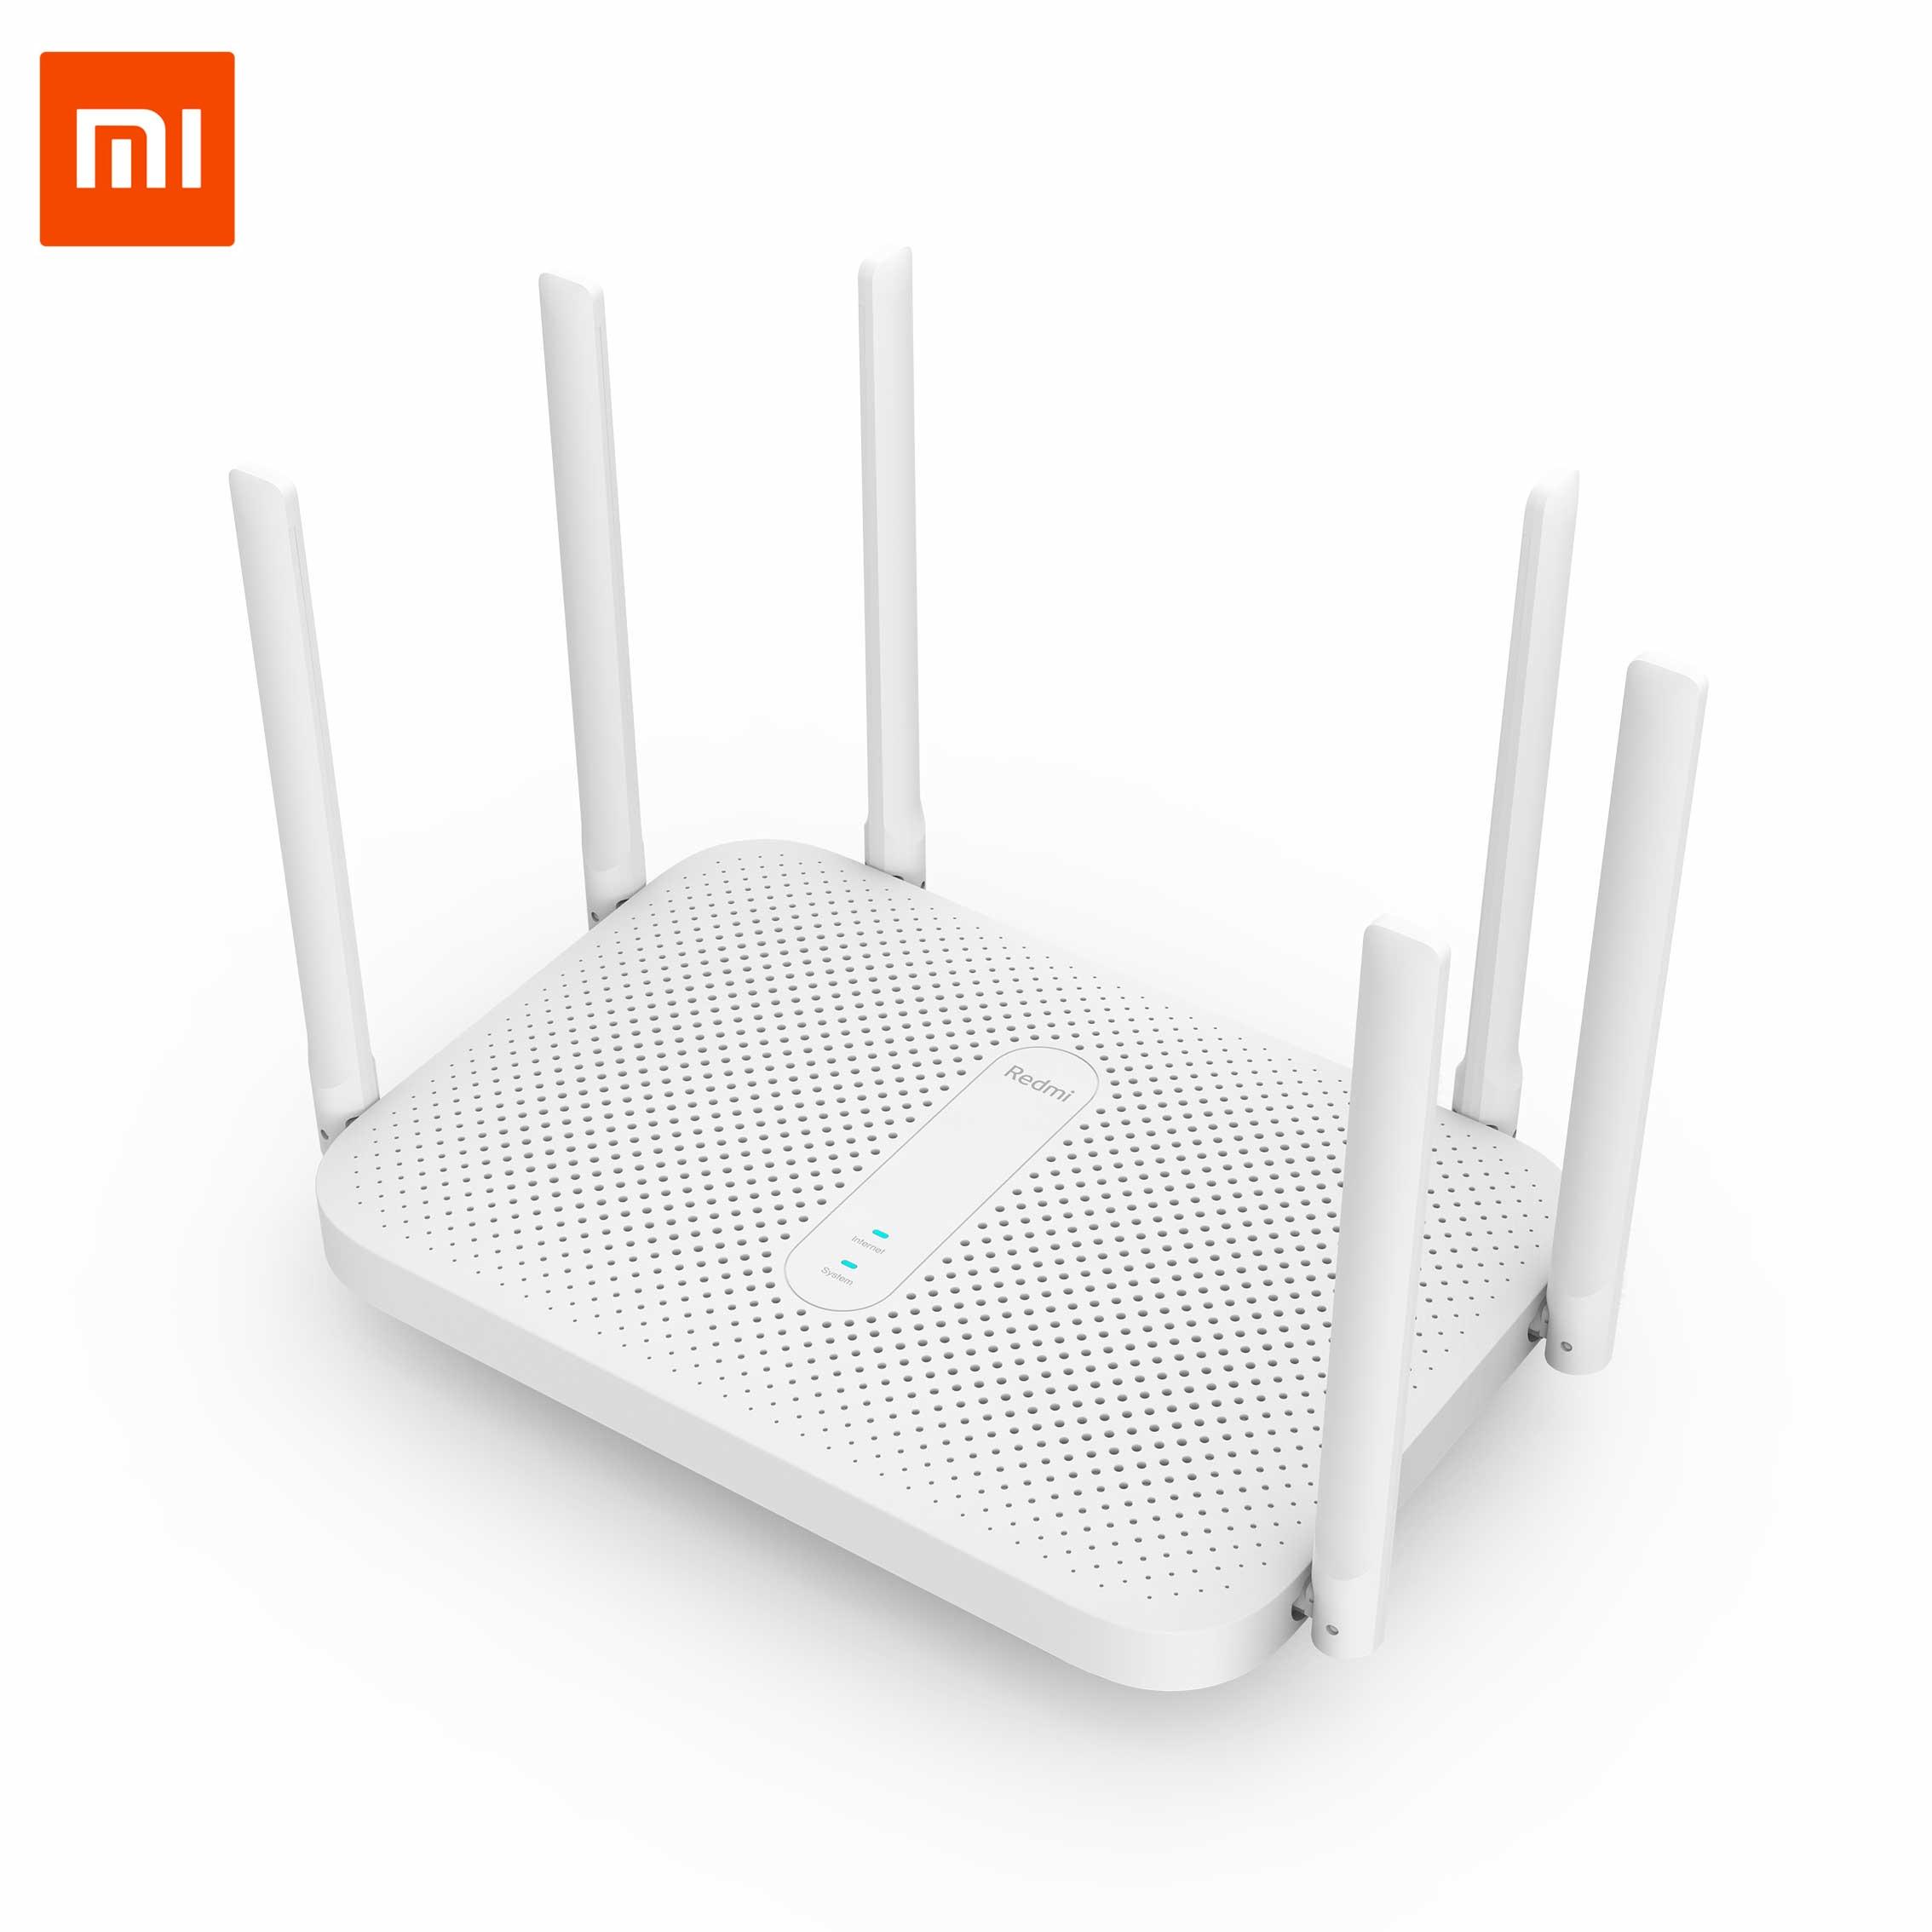 Original Xiaomi Redmi AC2100 Router Gigabit Router inalámbrico Wifi repetidor con 6 antenas de alta ganancia Configuración de cobertura más amplia inteligente